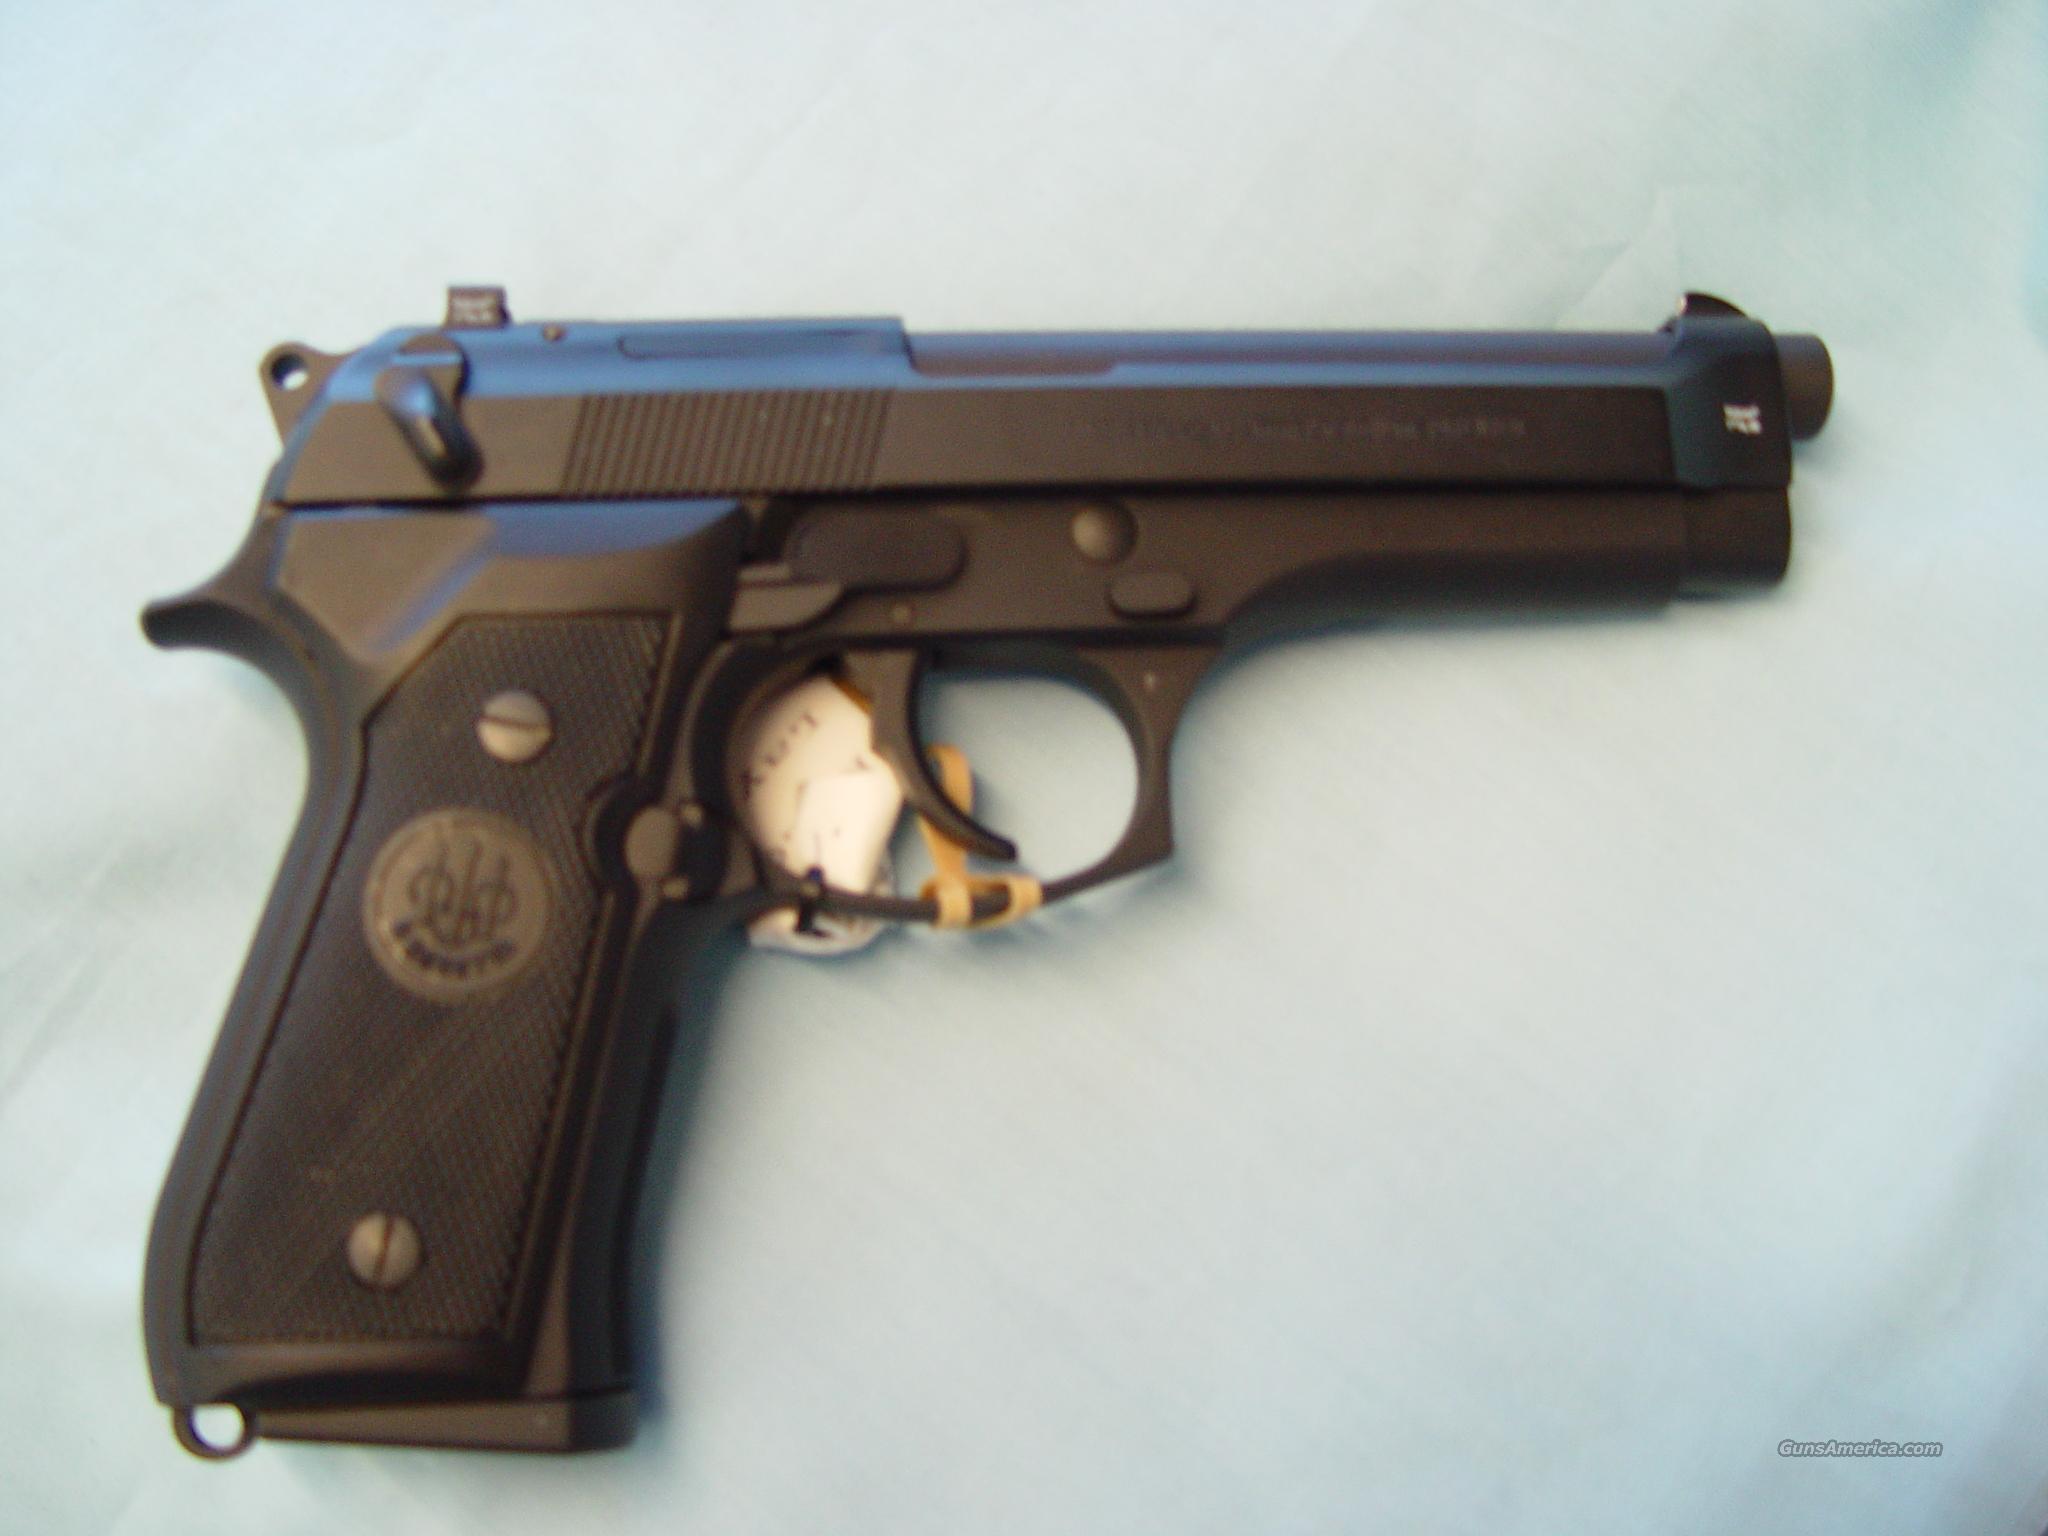 Beretta 92 FS 9mm Parabellum for sale